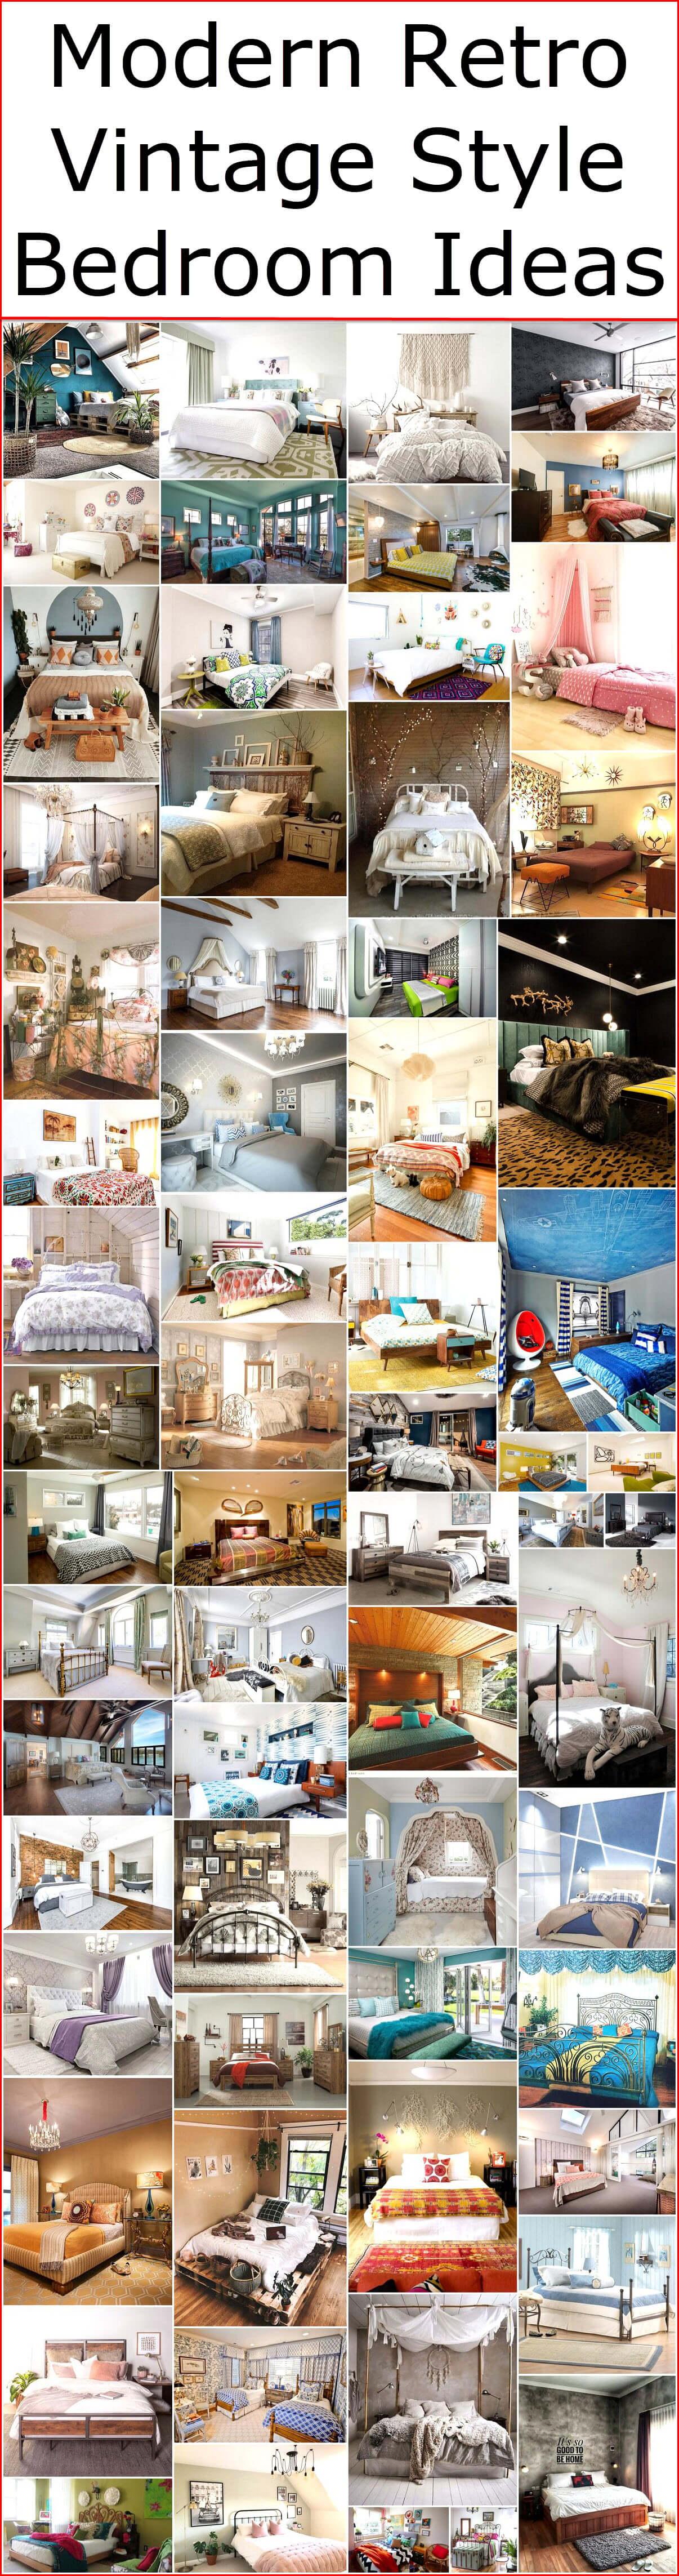 Modern Retro Vintage Style Bedroom Ideas